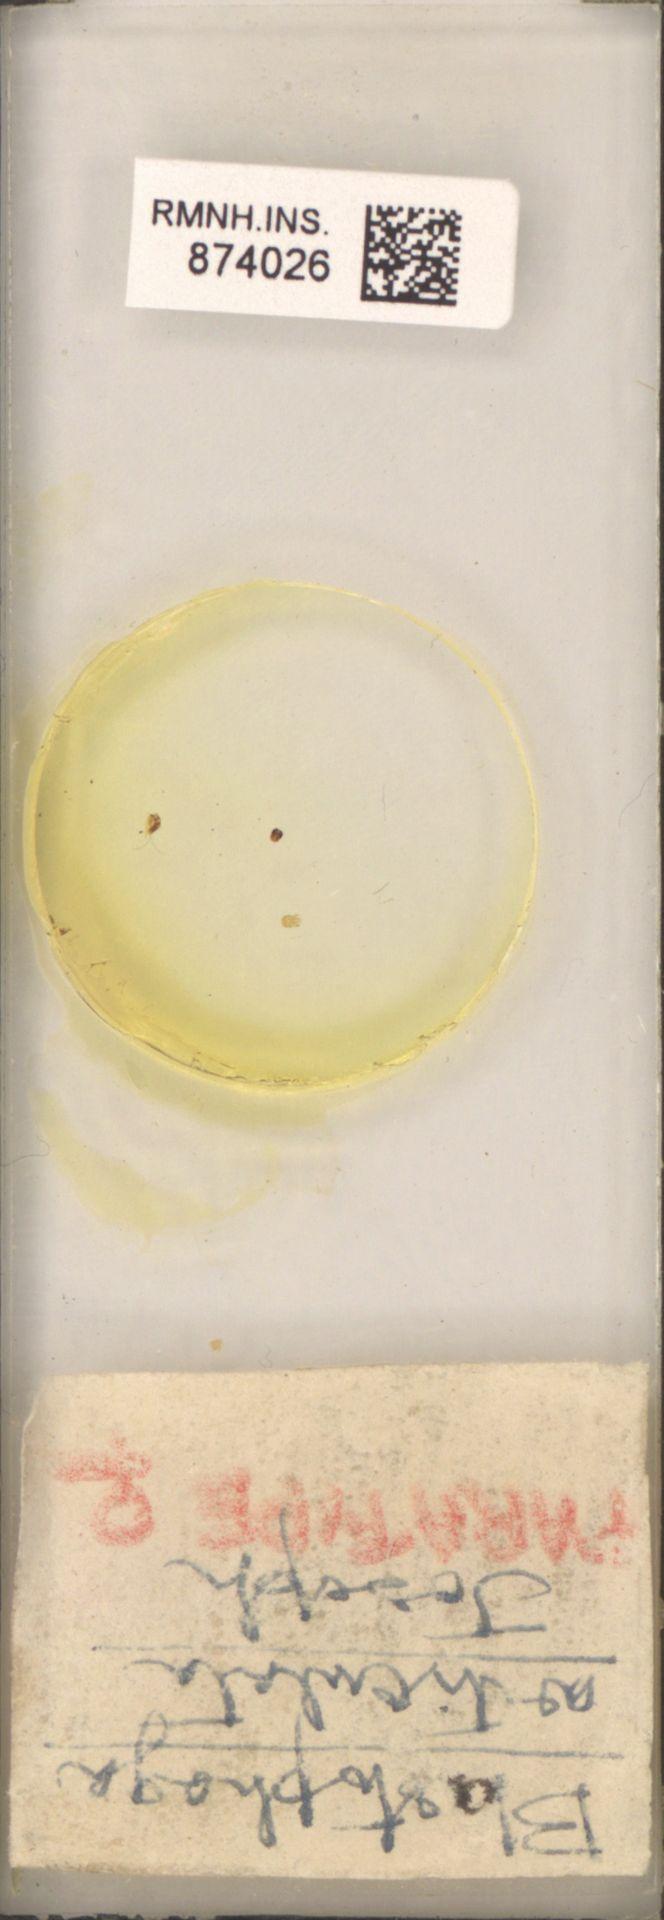 RMNH.INS.874026 | Blastophaga articulata Joseph.